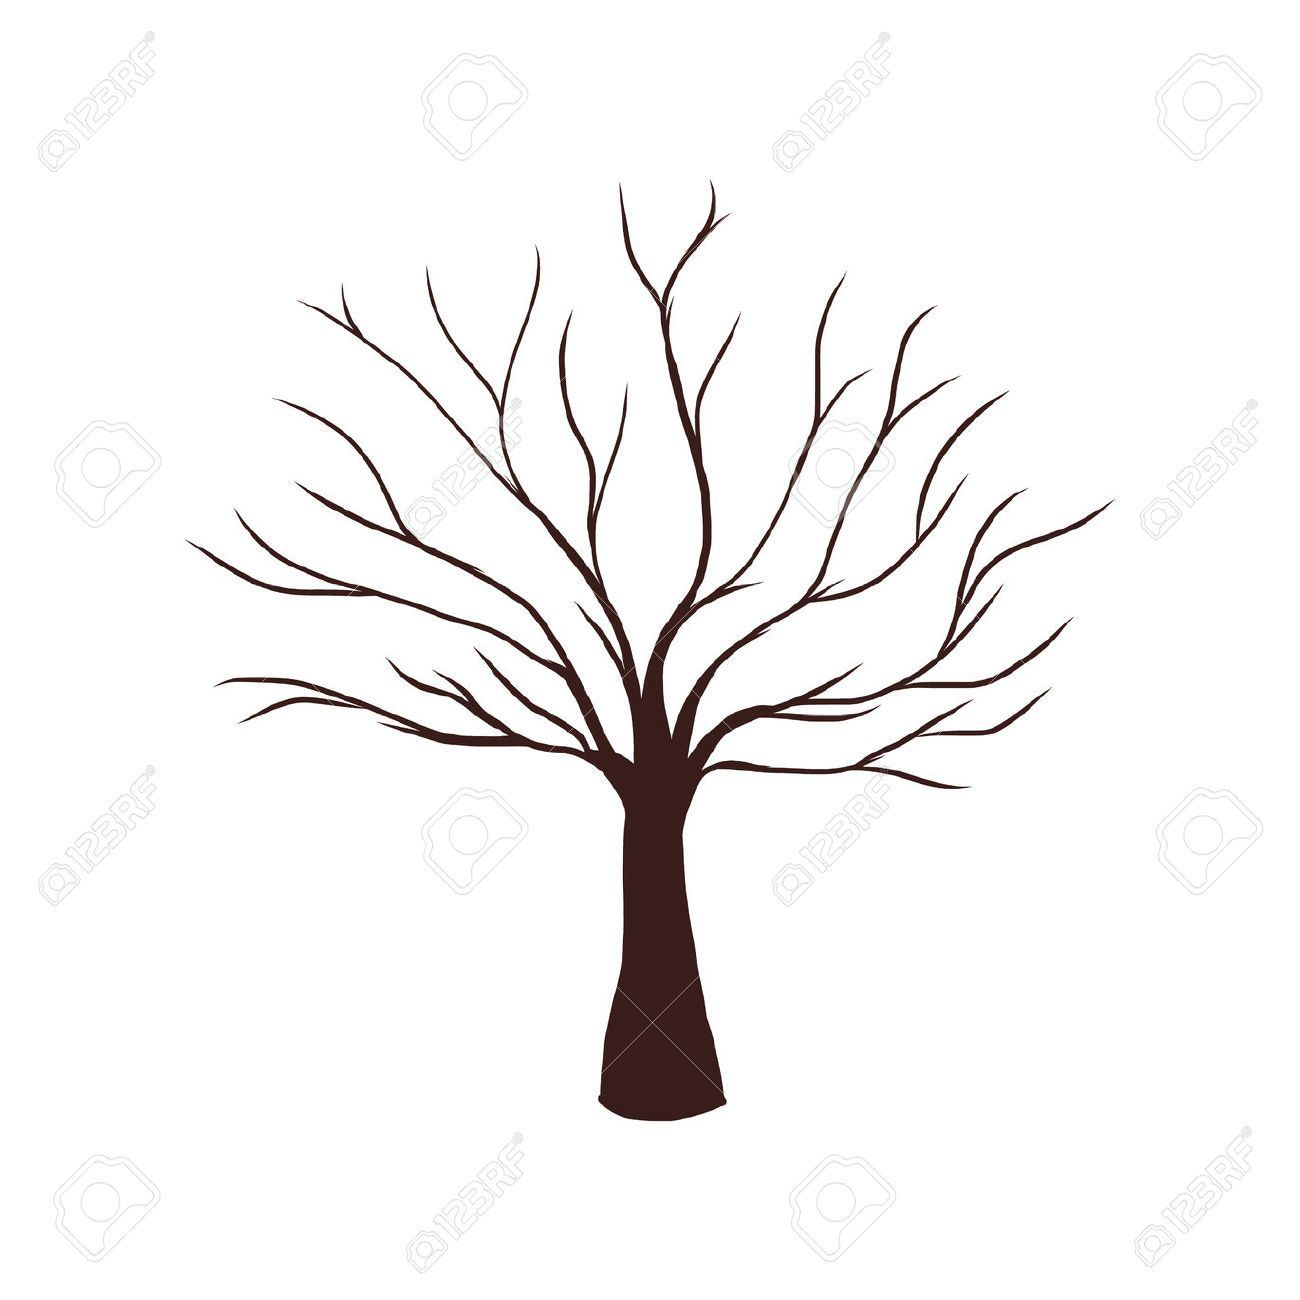 tronco arbol dibujo  Buscar con Google  troncos  Pinterest